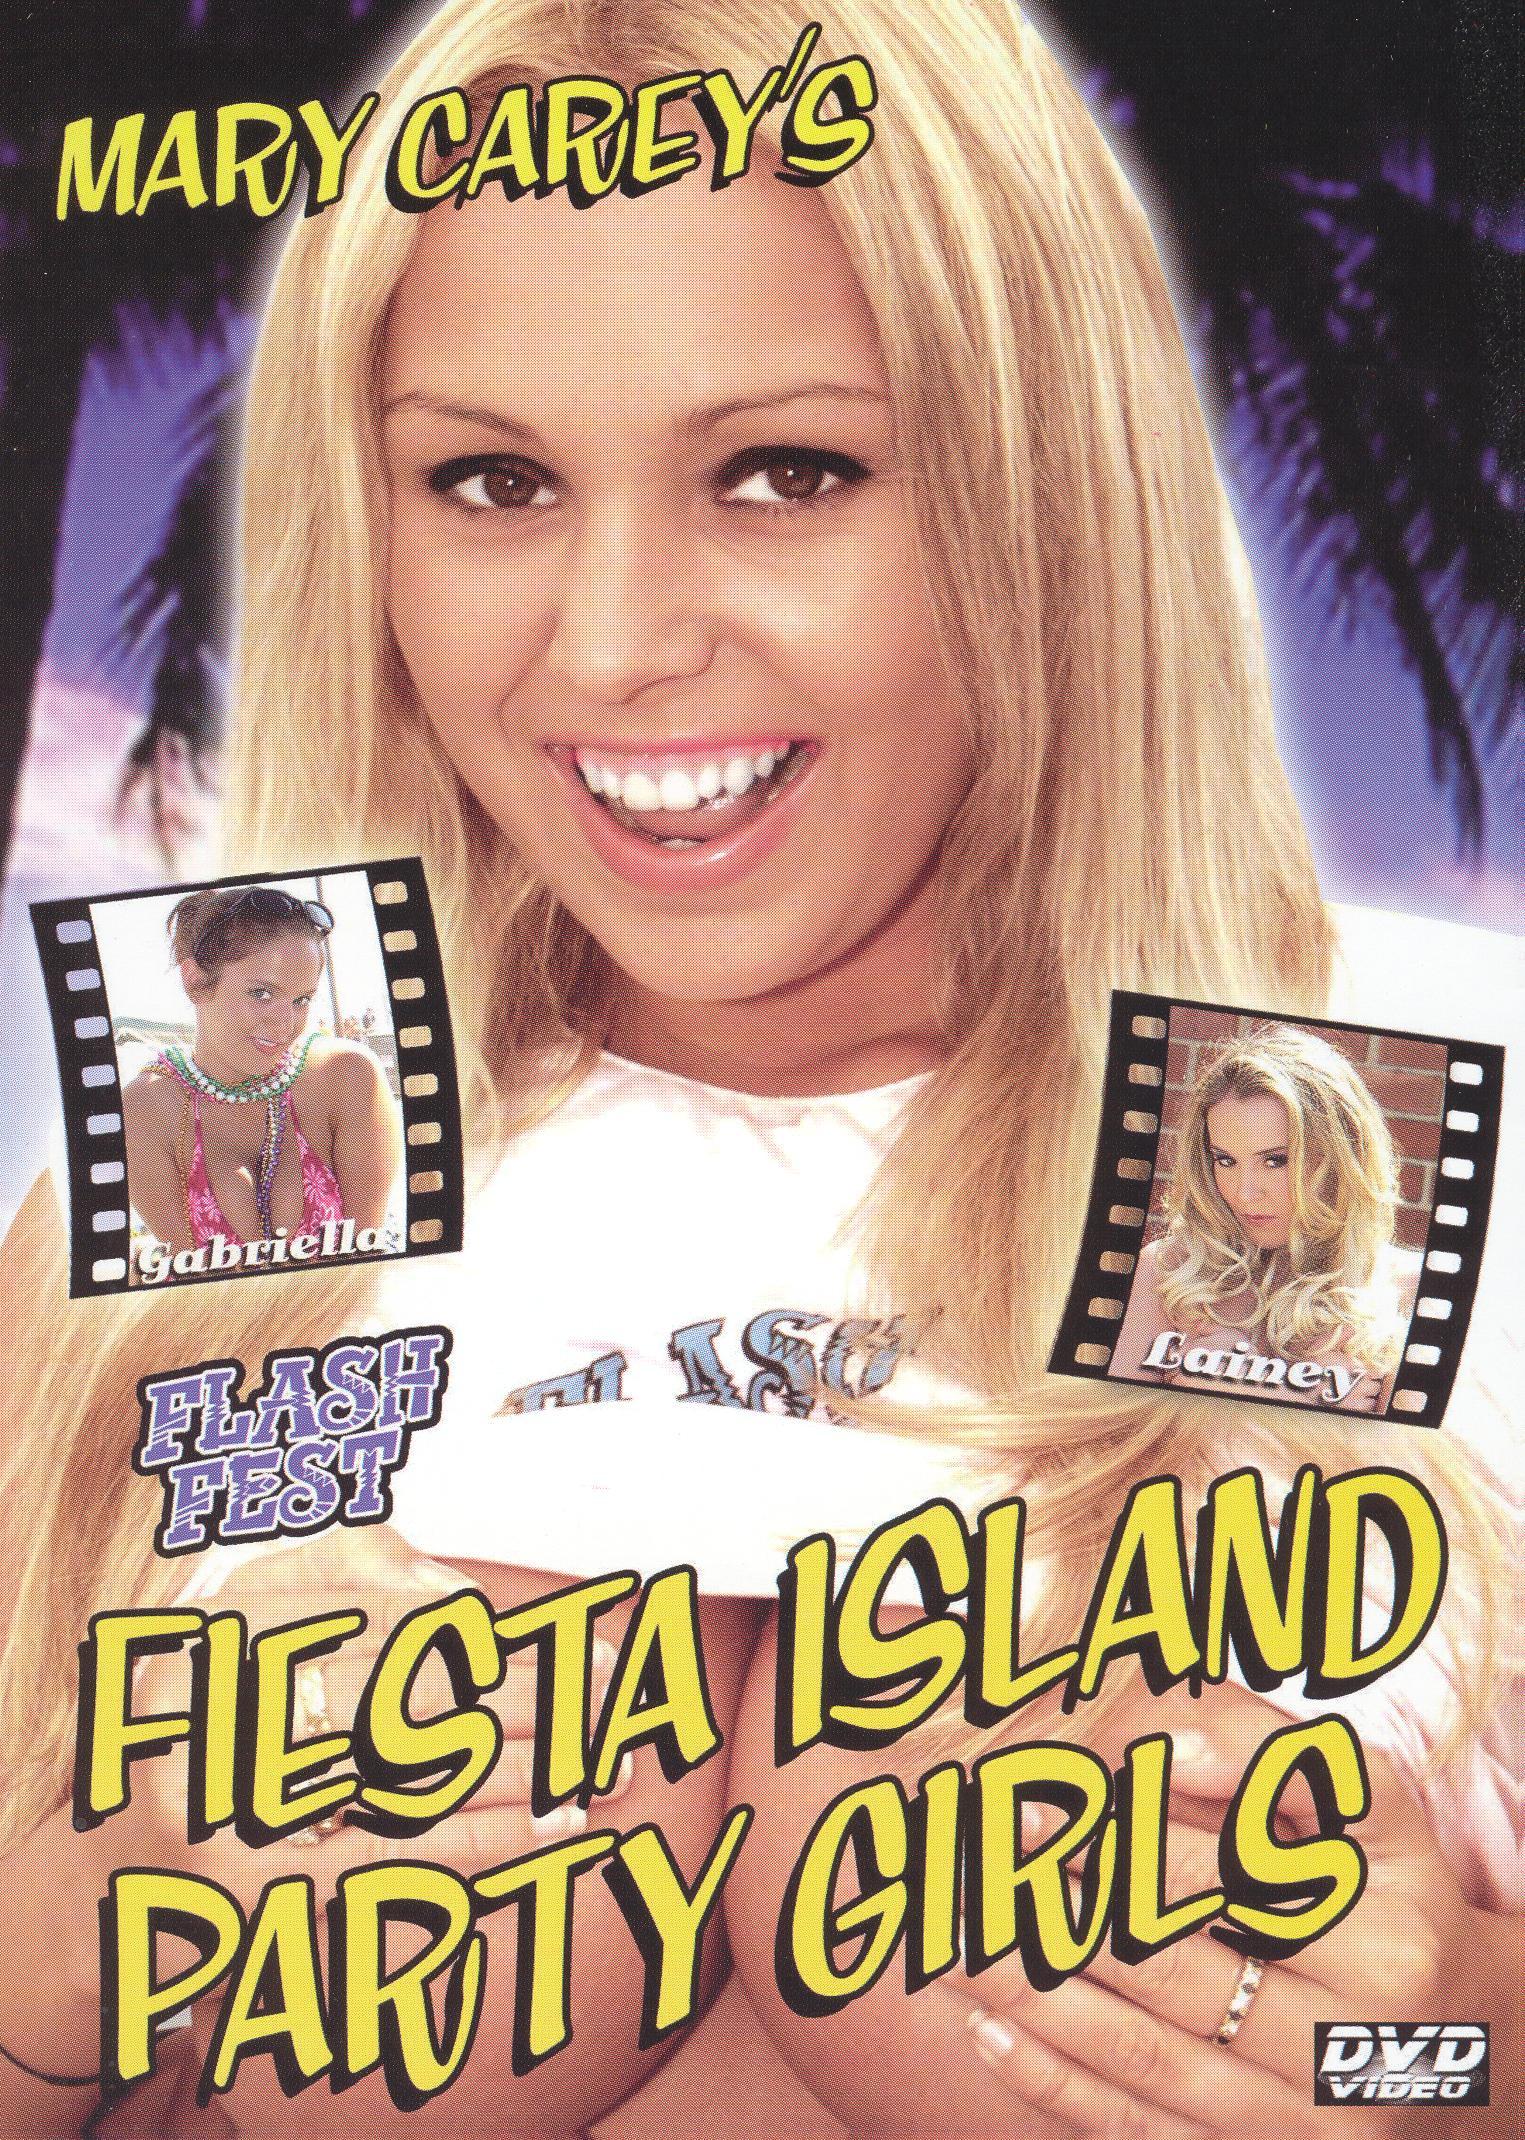 Fiesta Island Party Girls Featuring Mary Carey